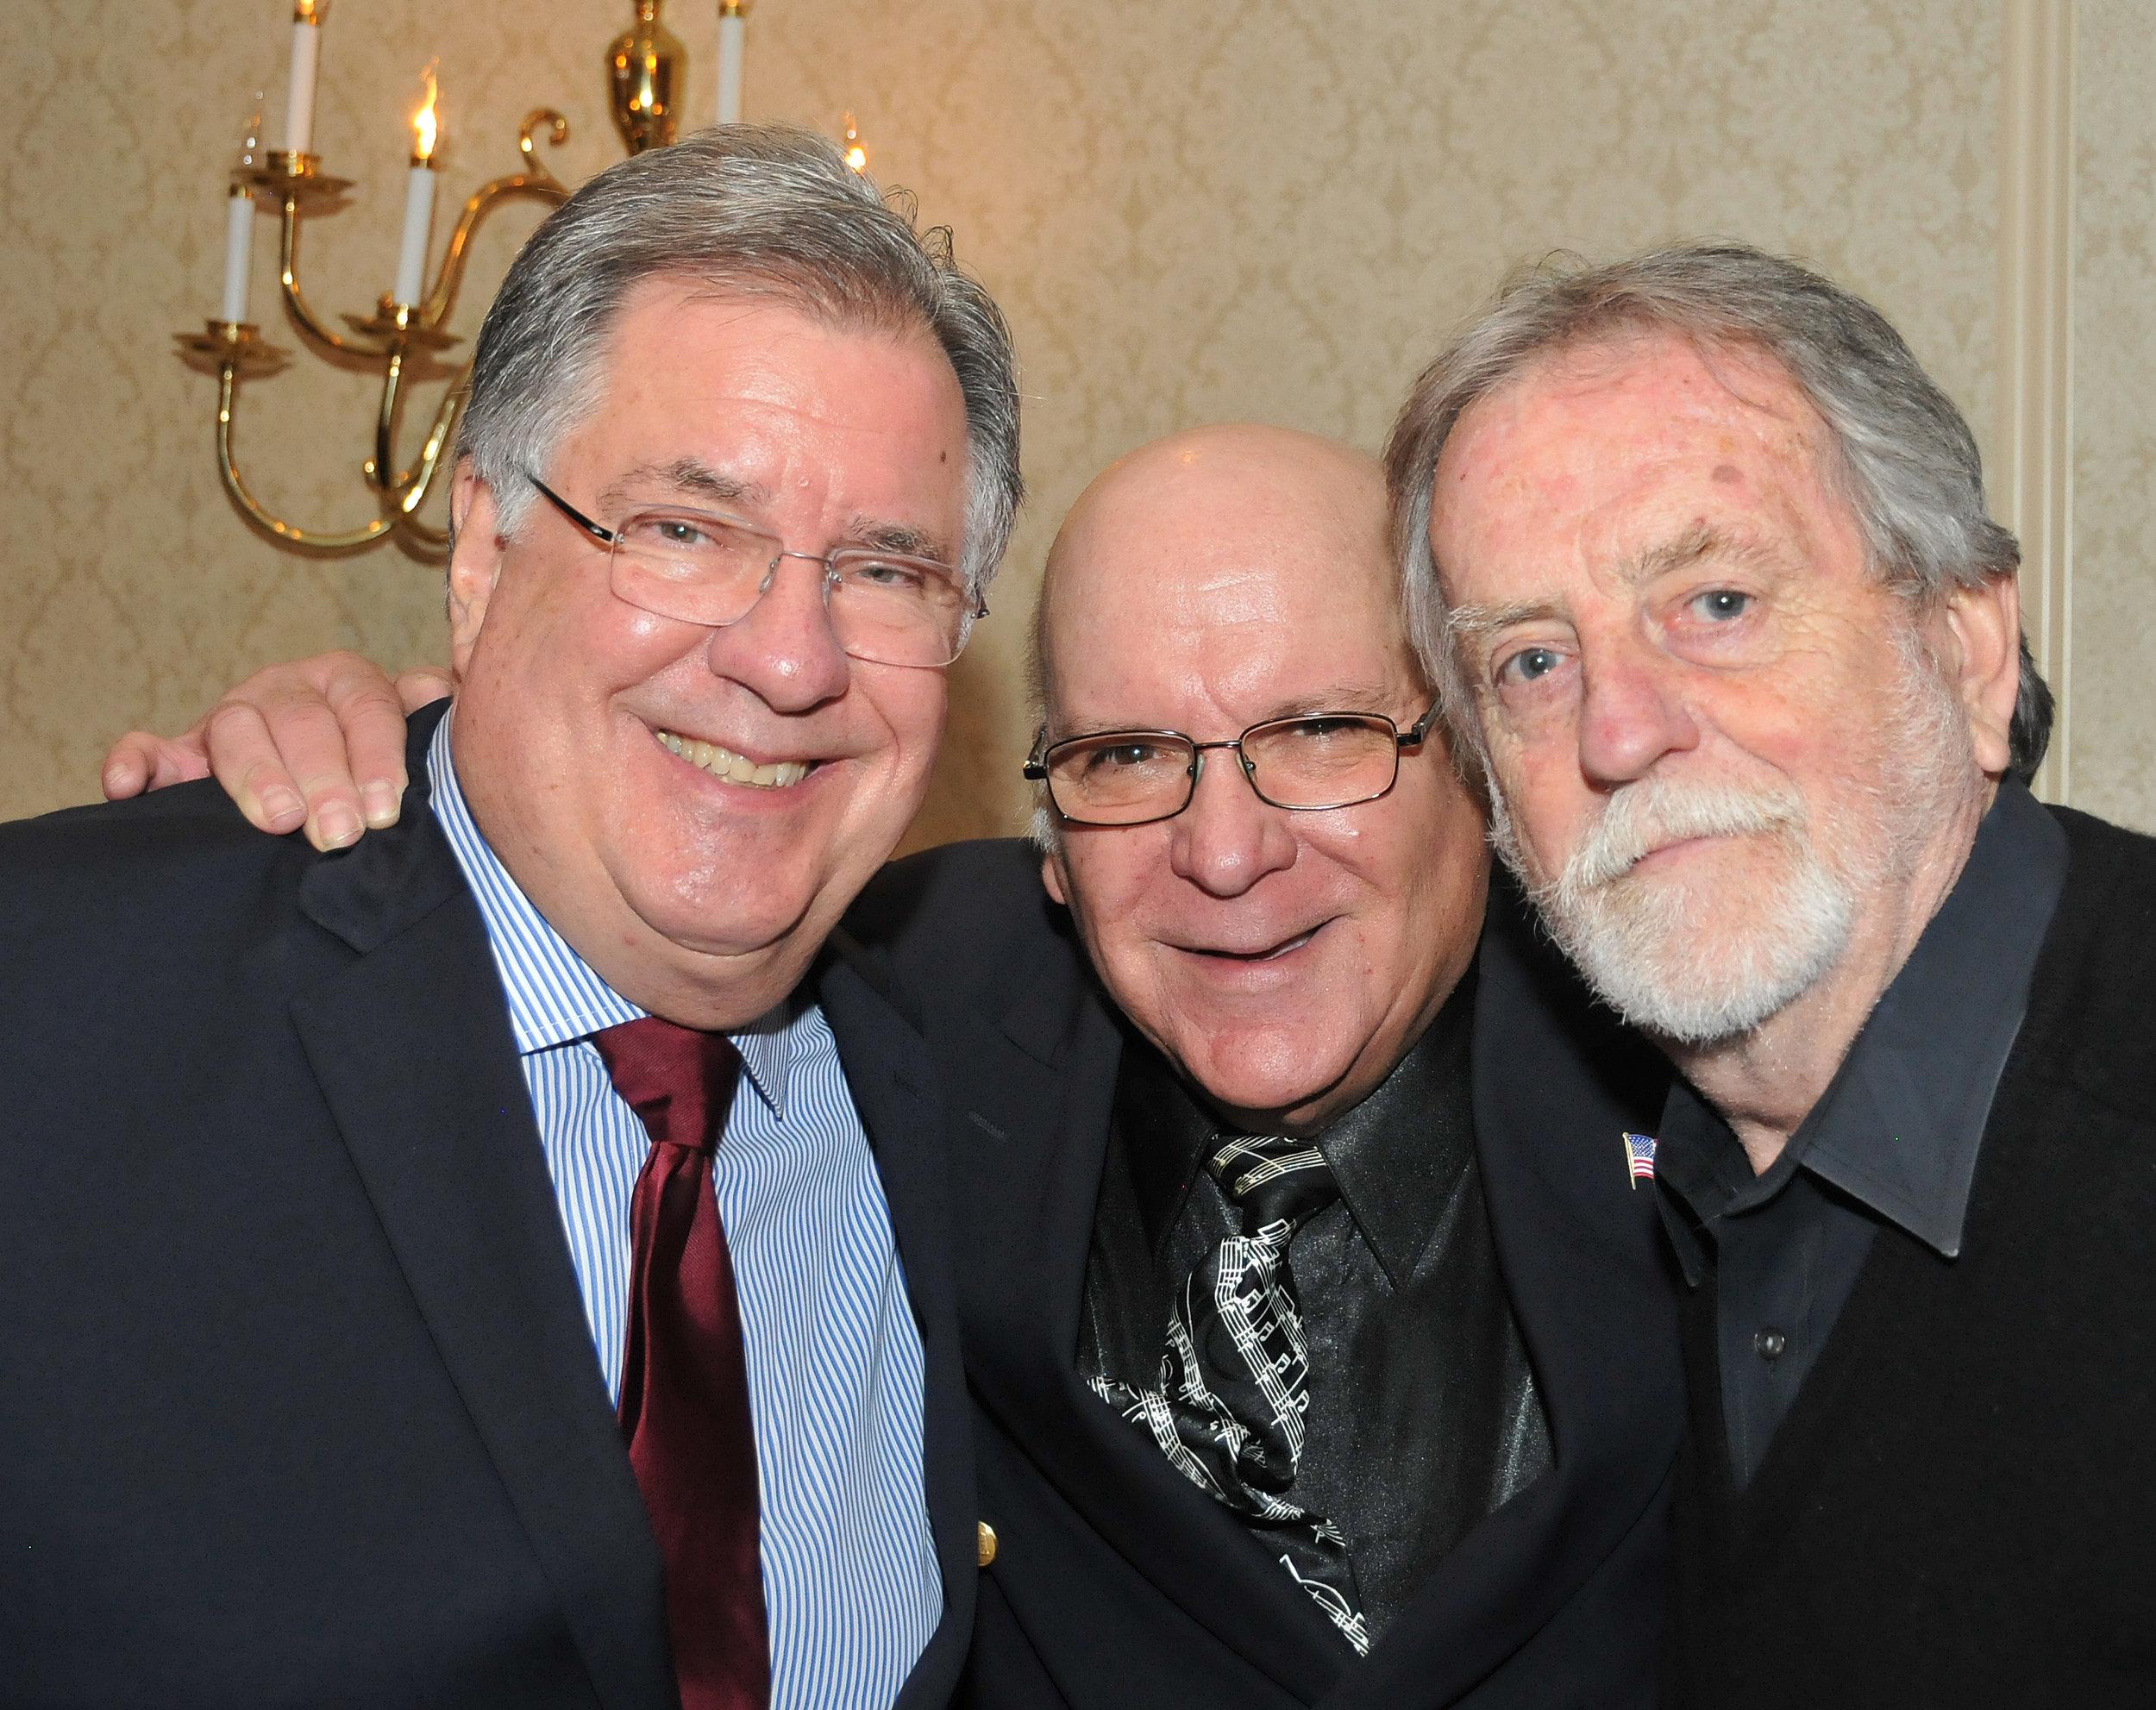 Brian Morgan, Ray Murray & Me.jpg